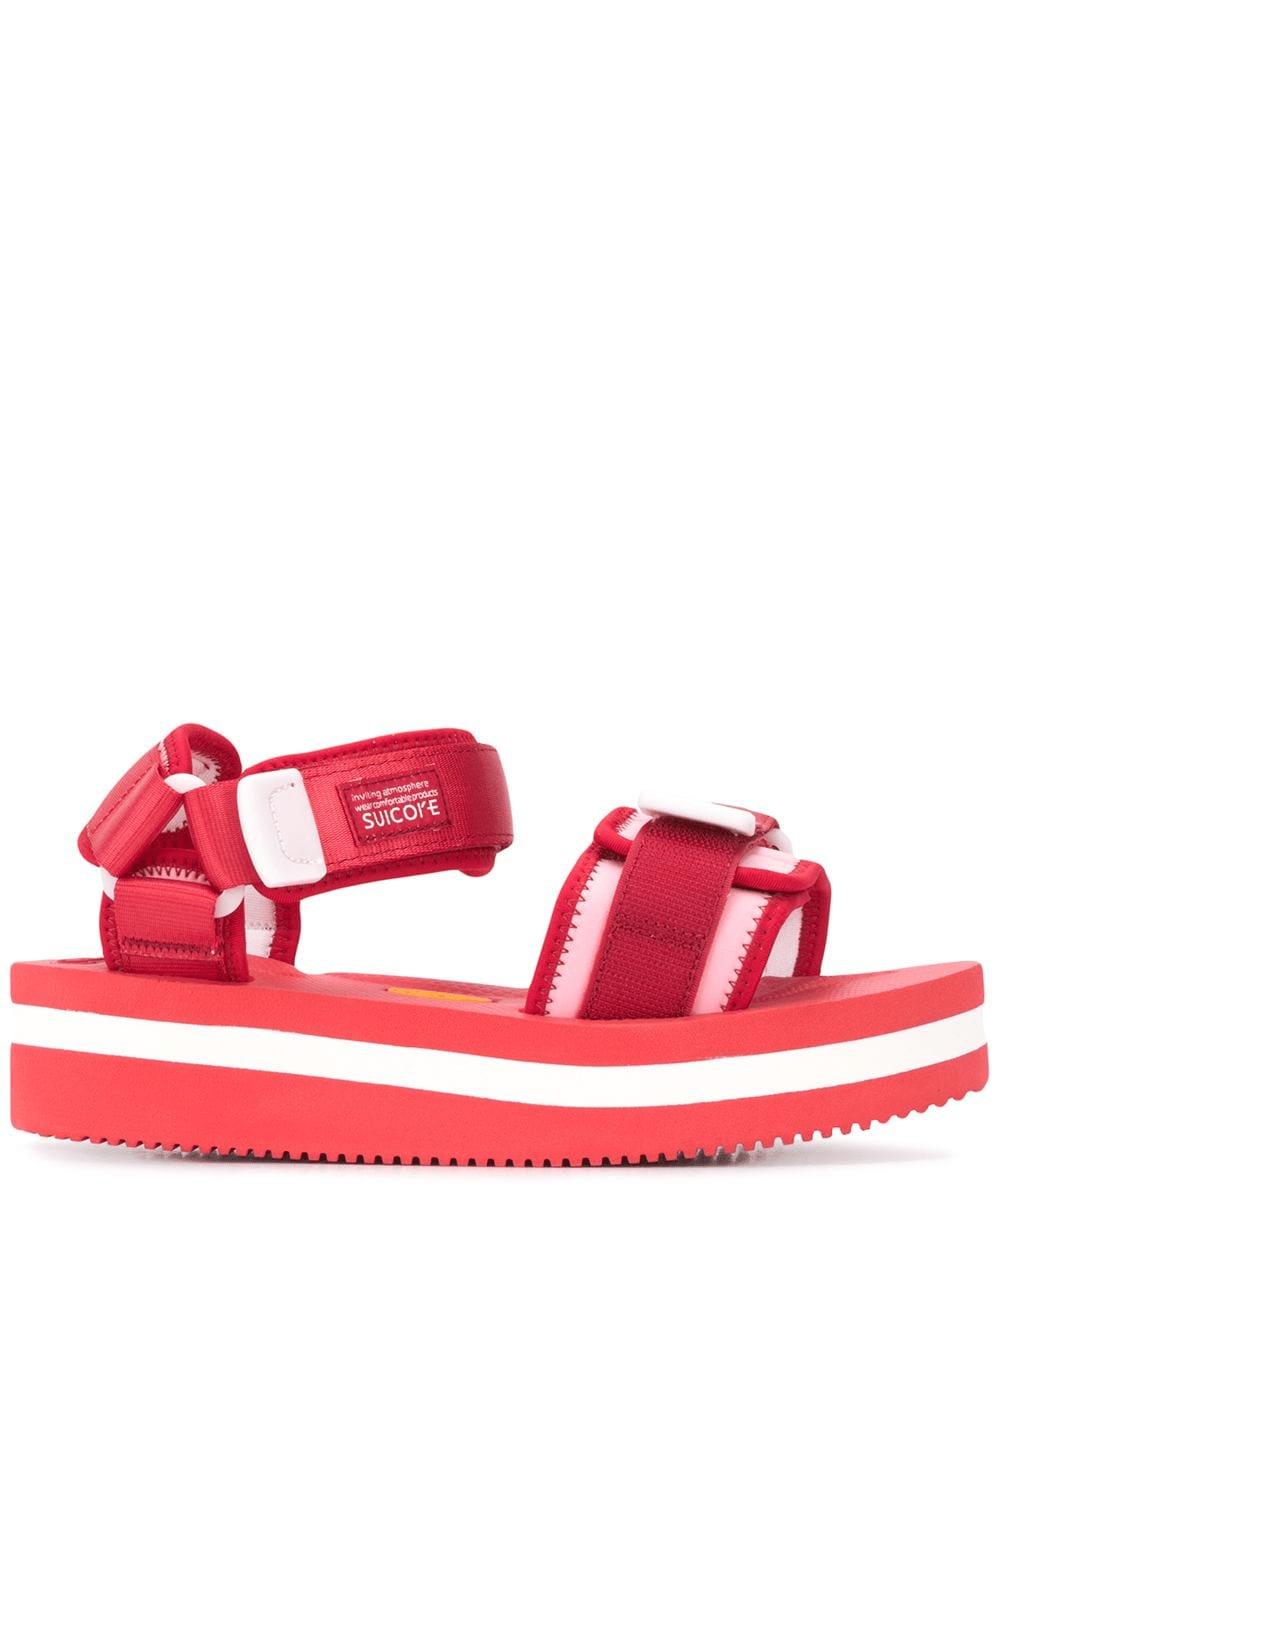 Hiking Sandals: Το πιο πολυσυζητημένο shoe trend είναι και το πιο άνετο